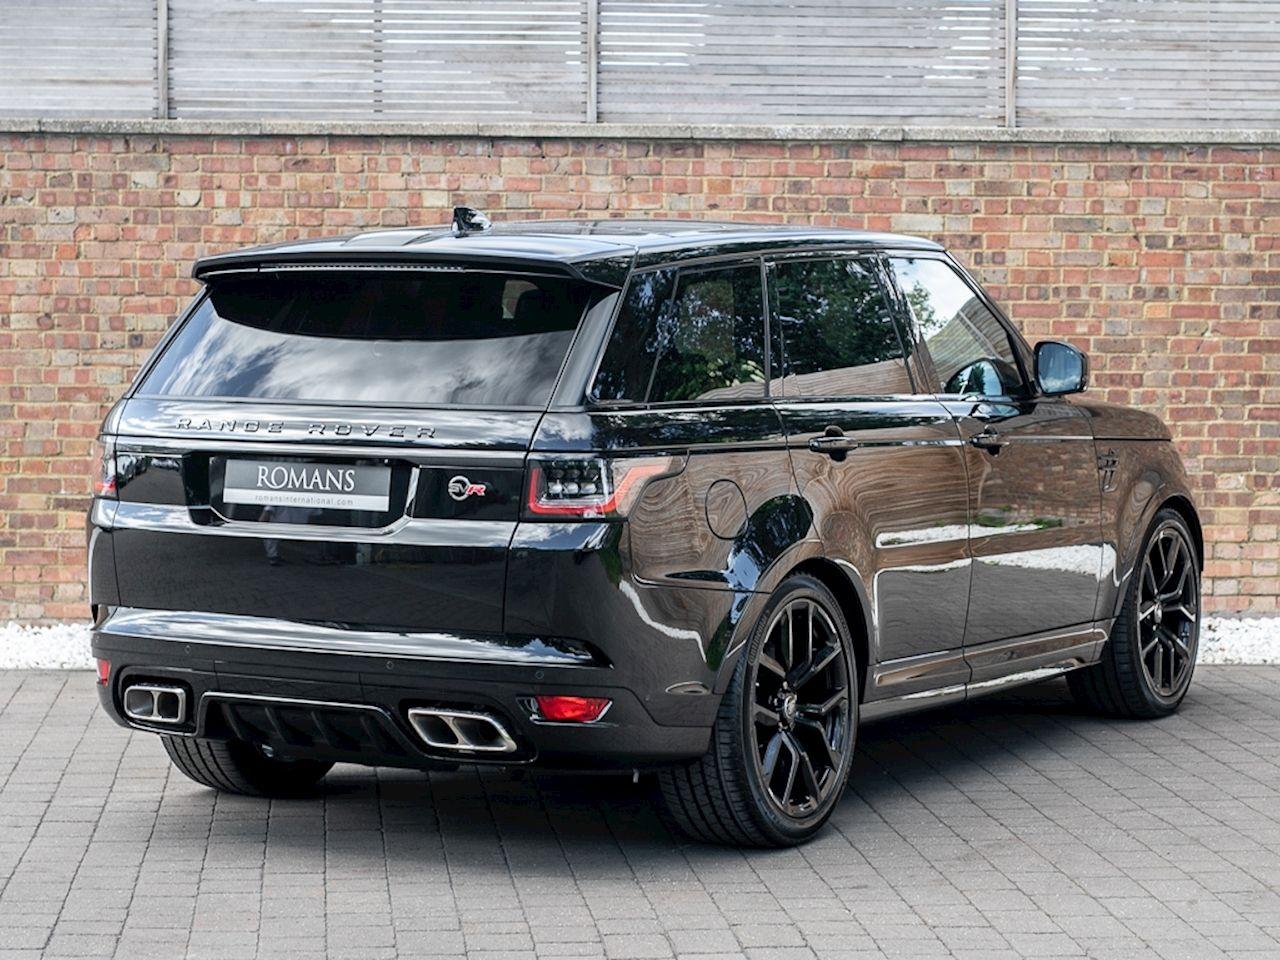 2018 Used Land Rover Range Rover Sport Svr in 2020 Range